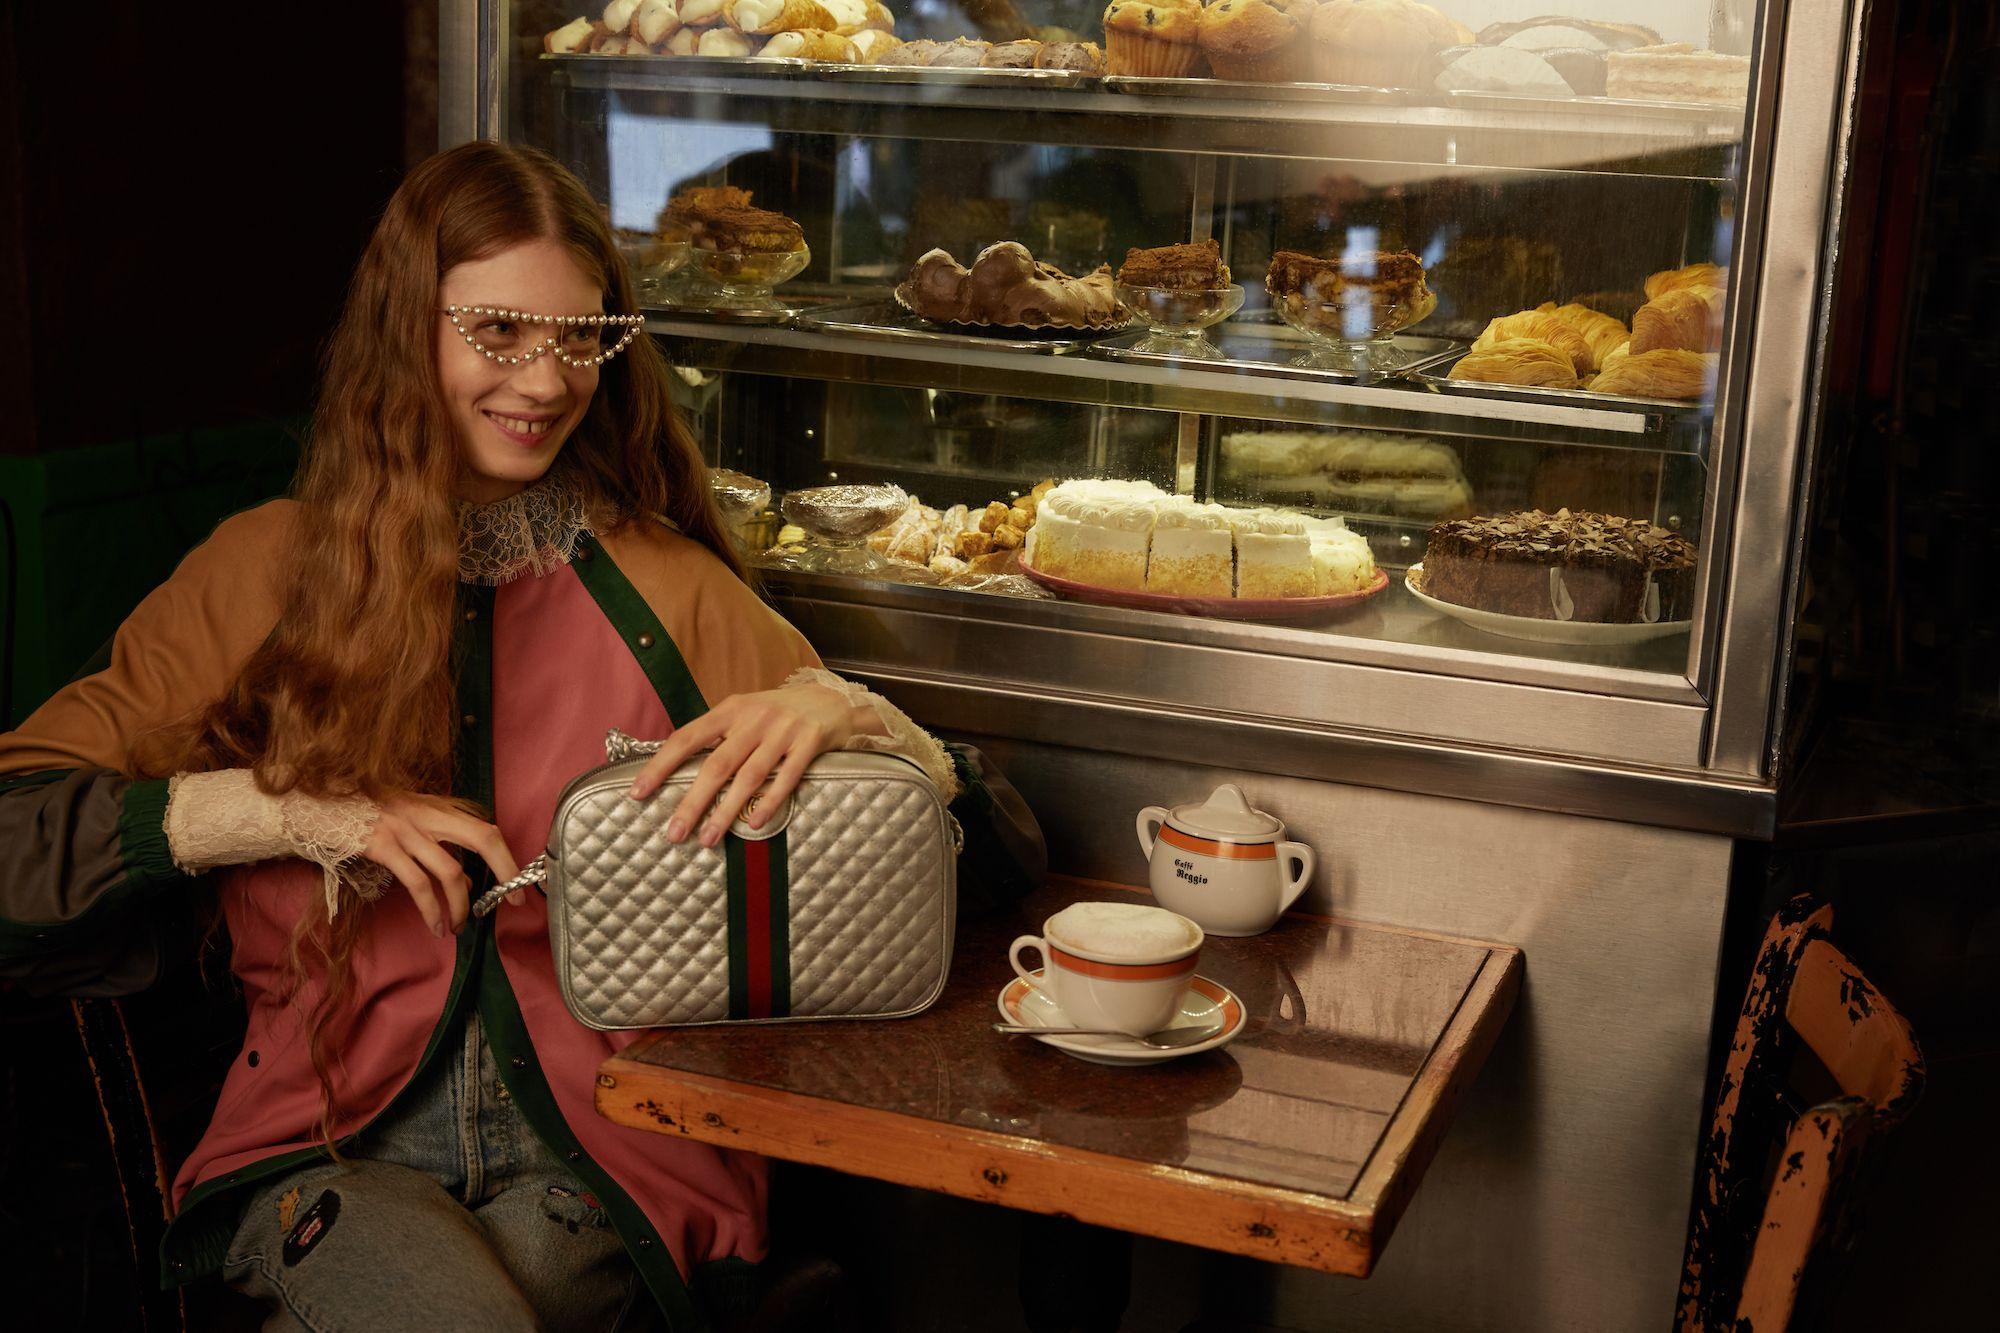 A model holding a Gucci bag